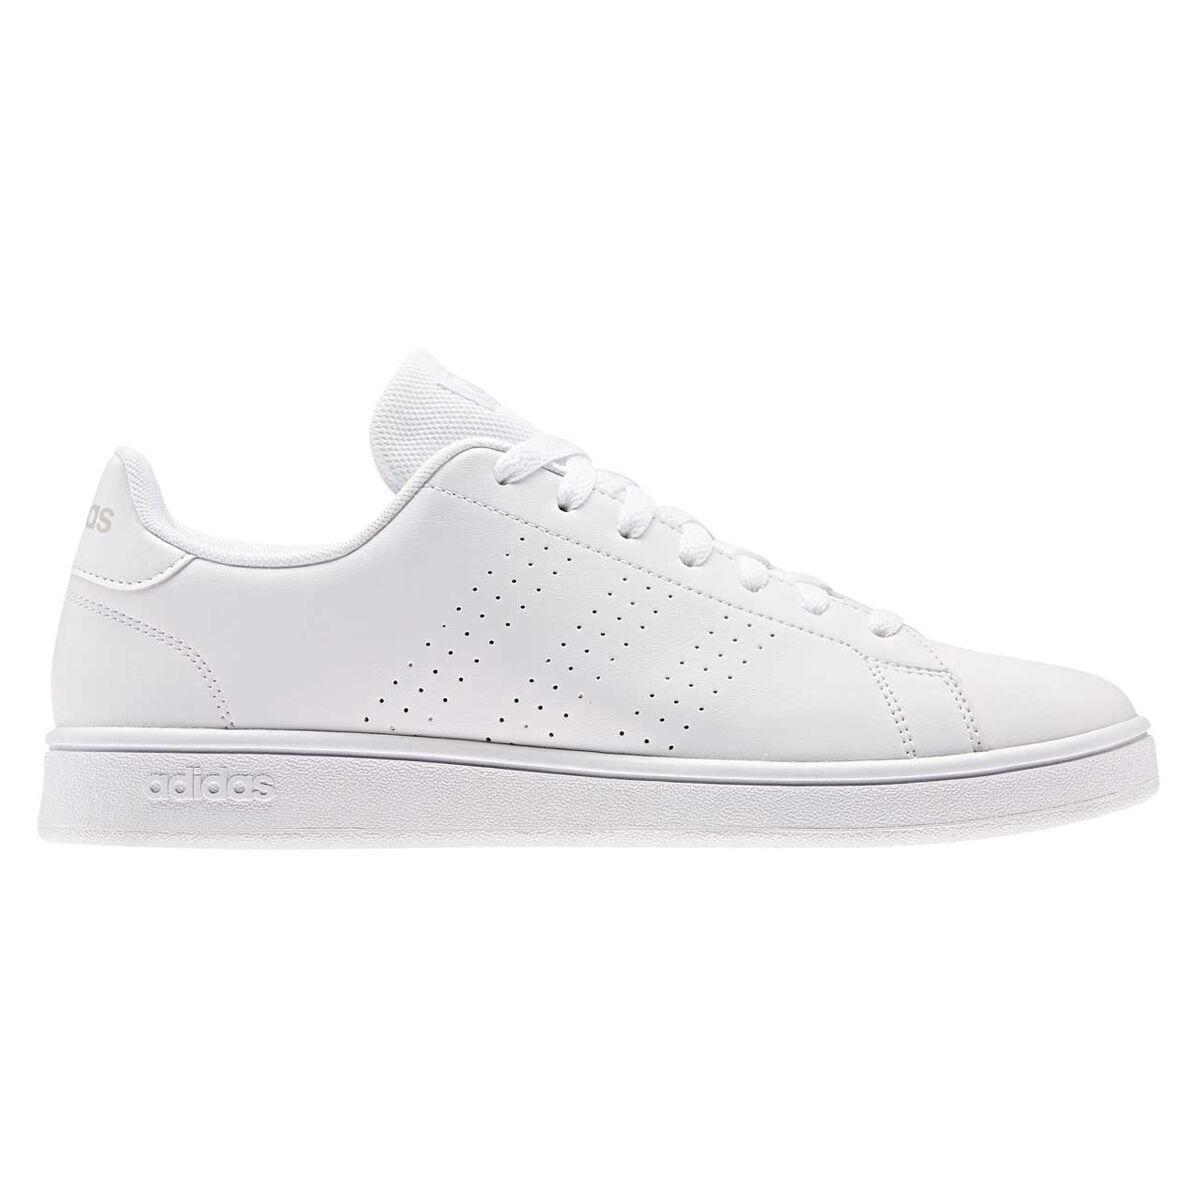 adidas Advantage Base Mens Casual Shoes